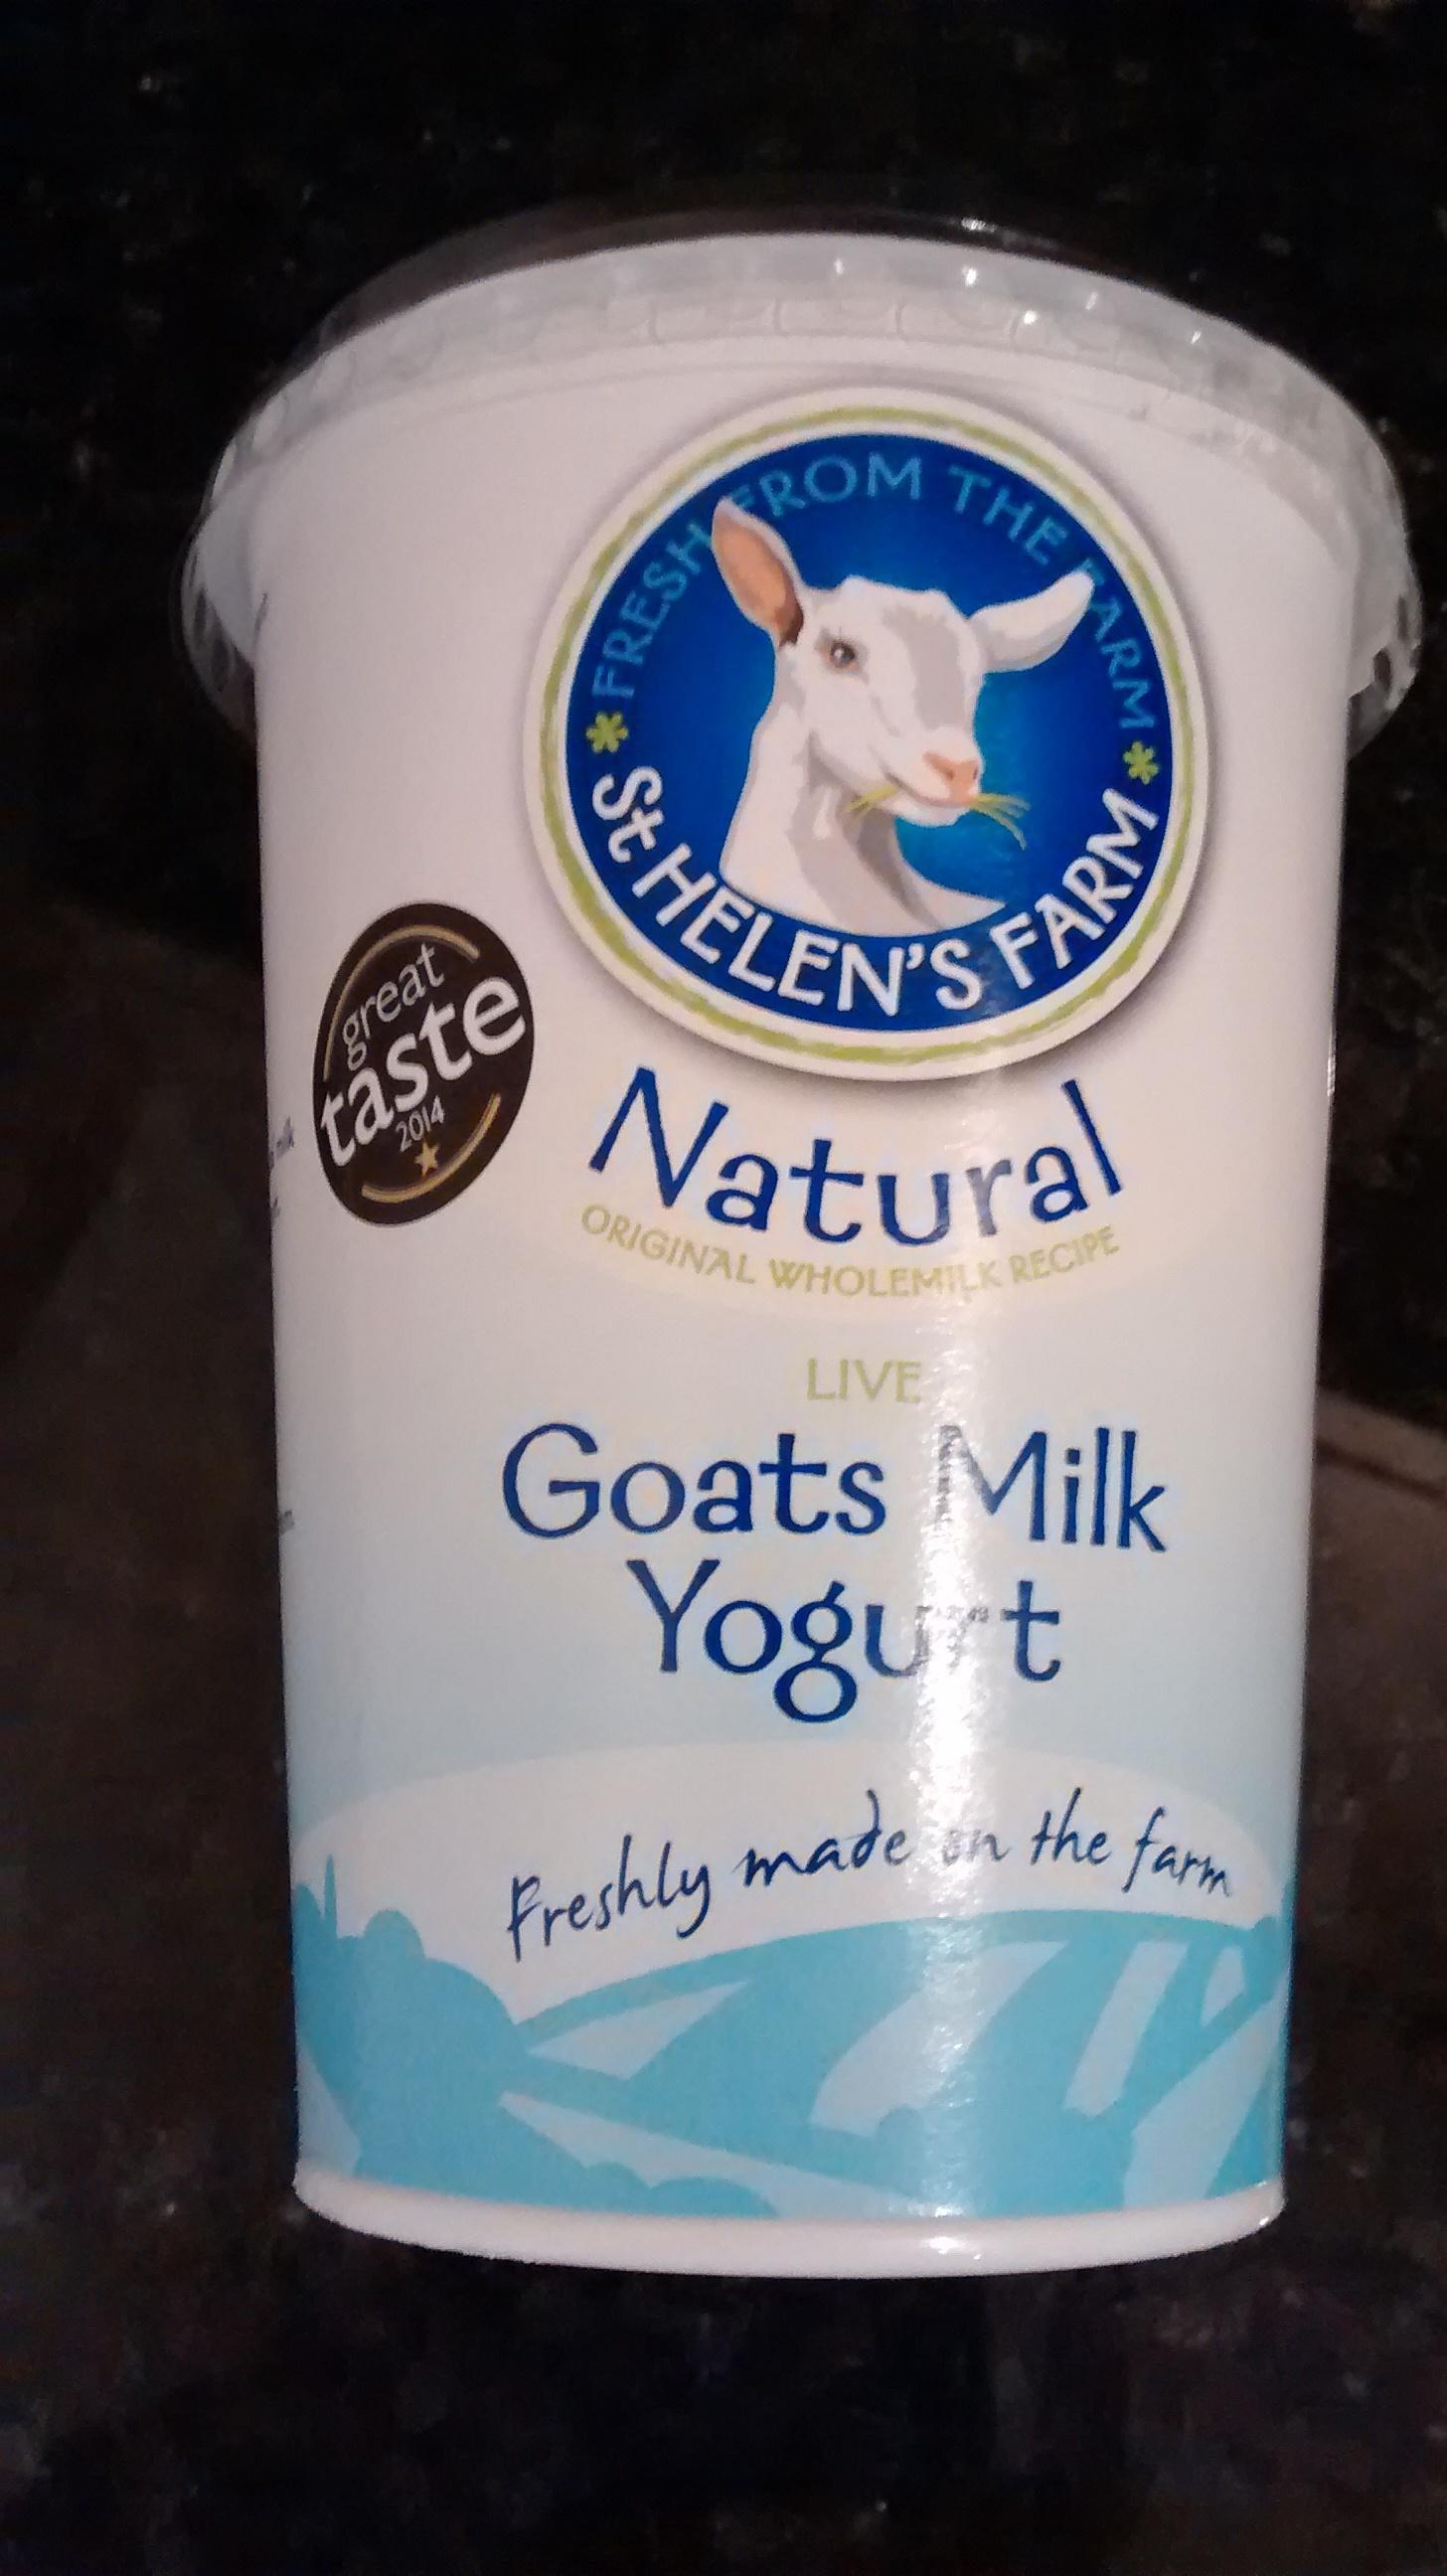 St Helen's Farm-Natural Goats Milk Yoghurt - Product - en